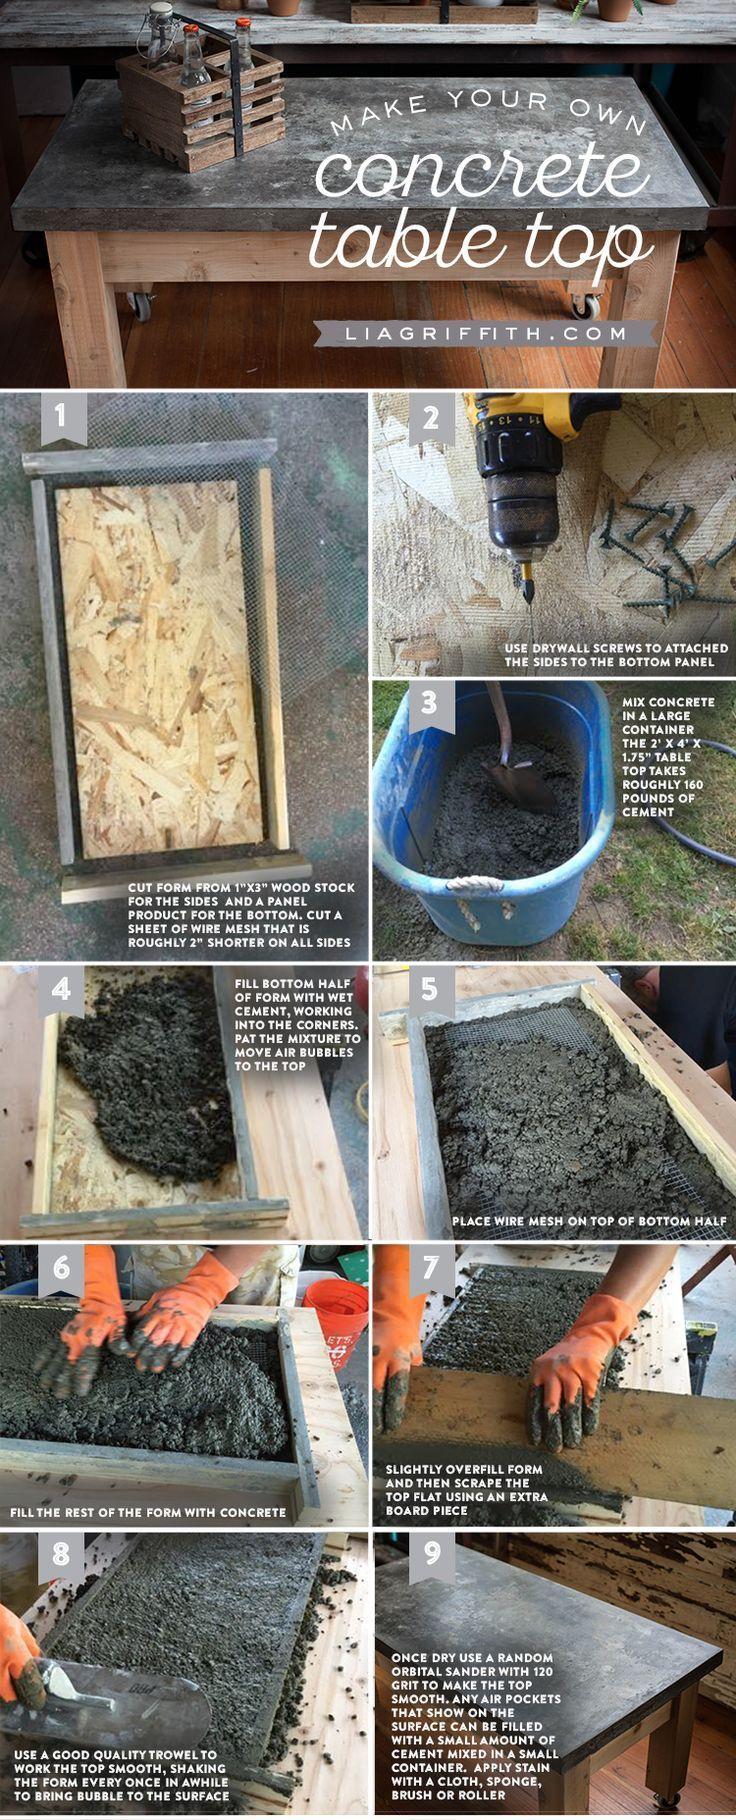 #ConcreteTableTutorial #DIYFurniture #OrchardSupplyHardware www.LiaGriffith.com